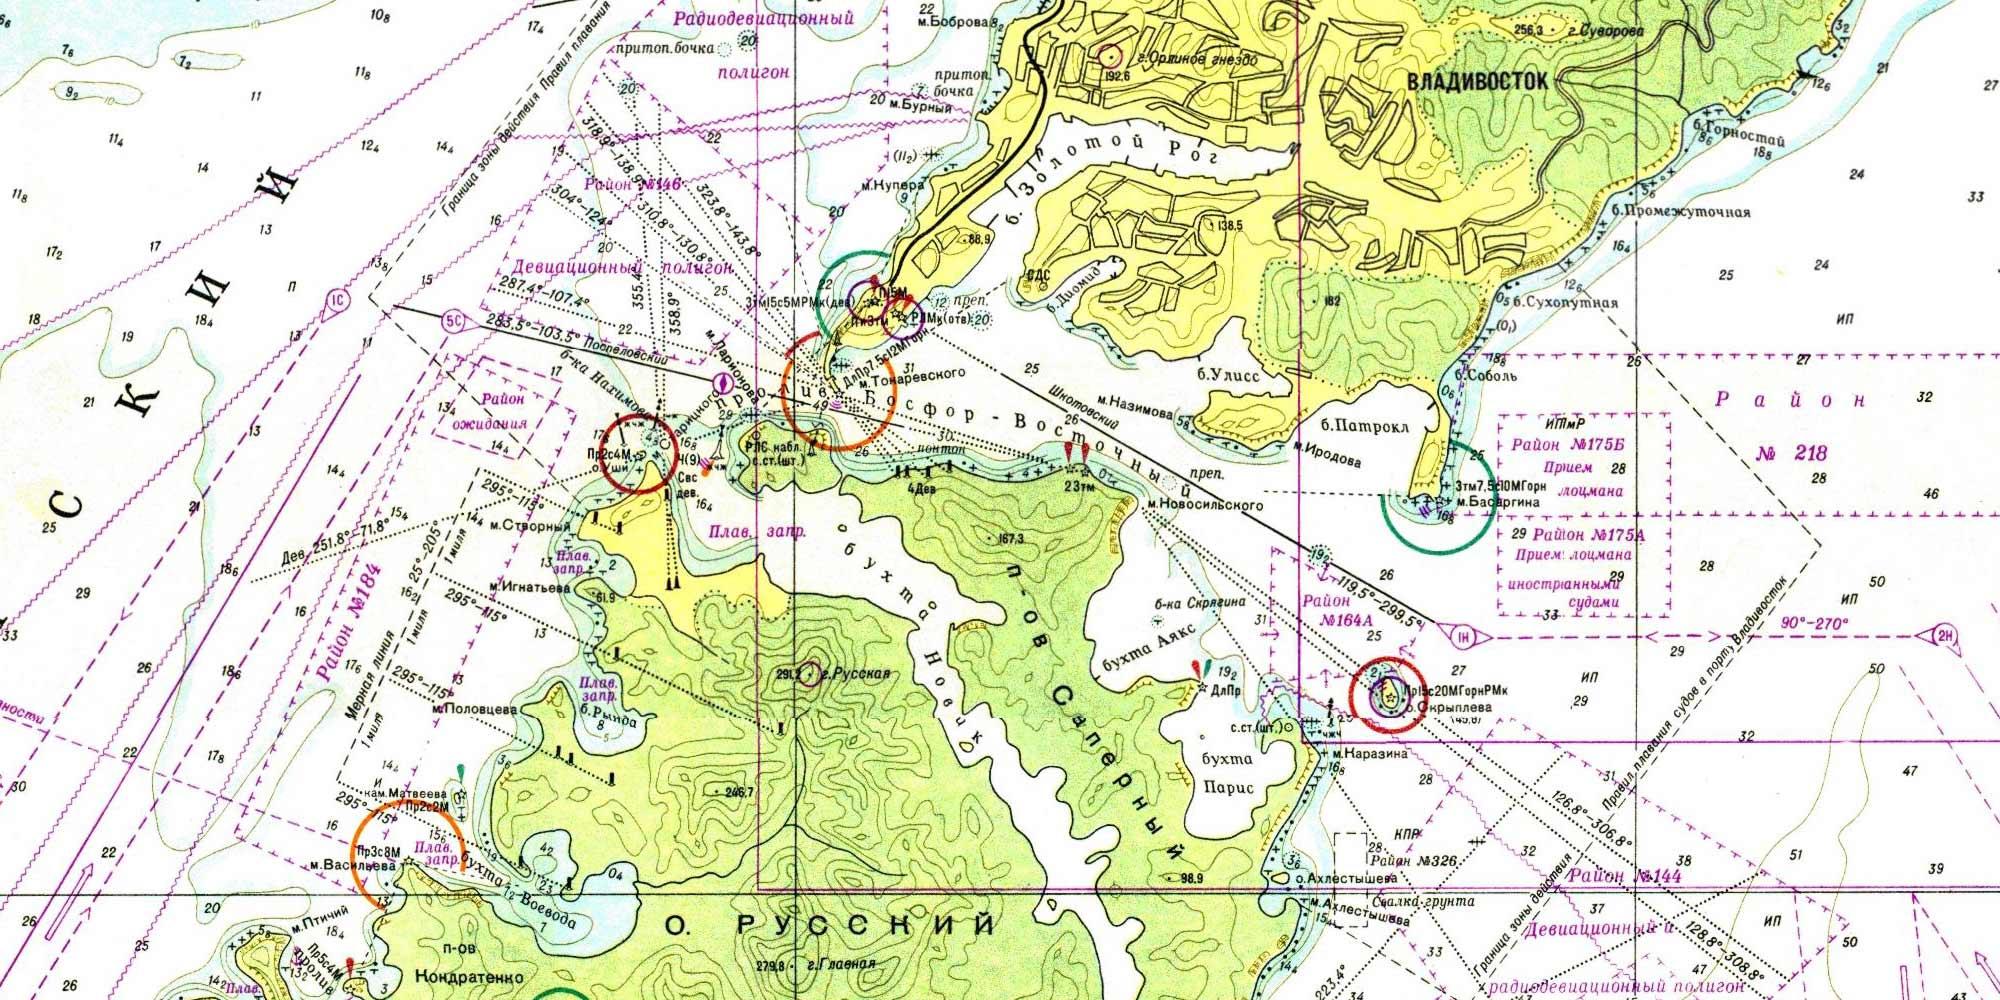 A nautical chart